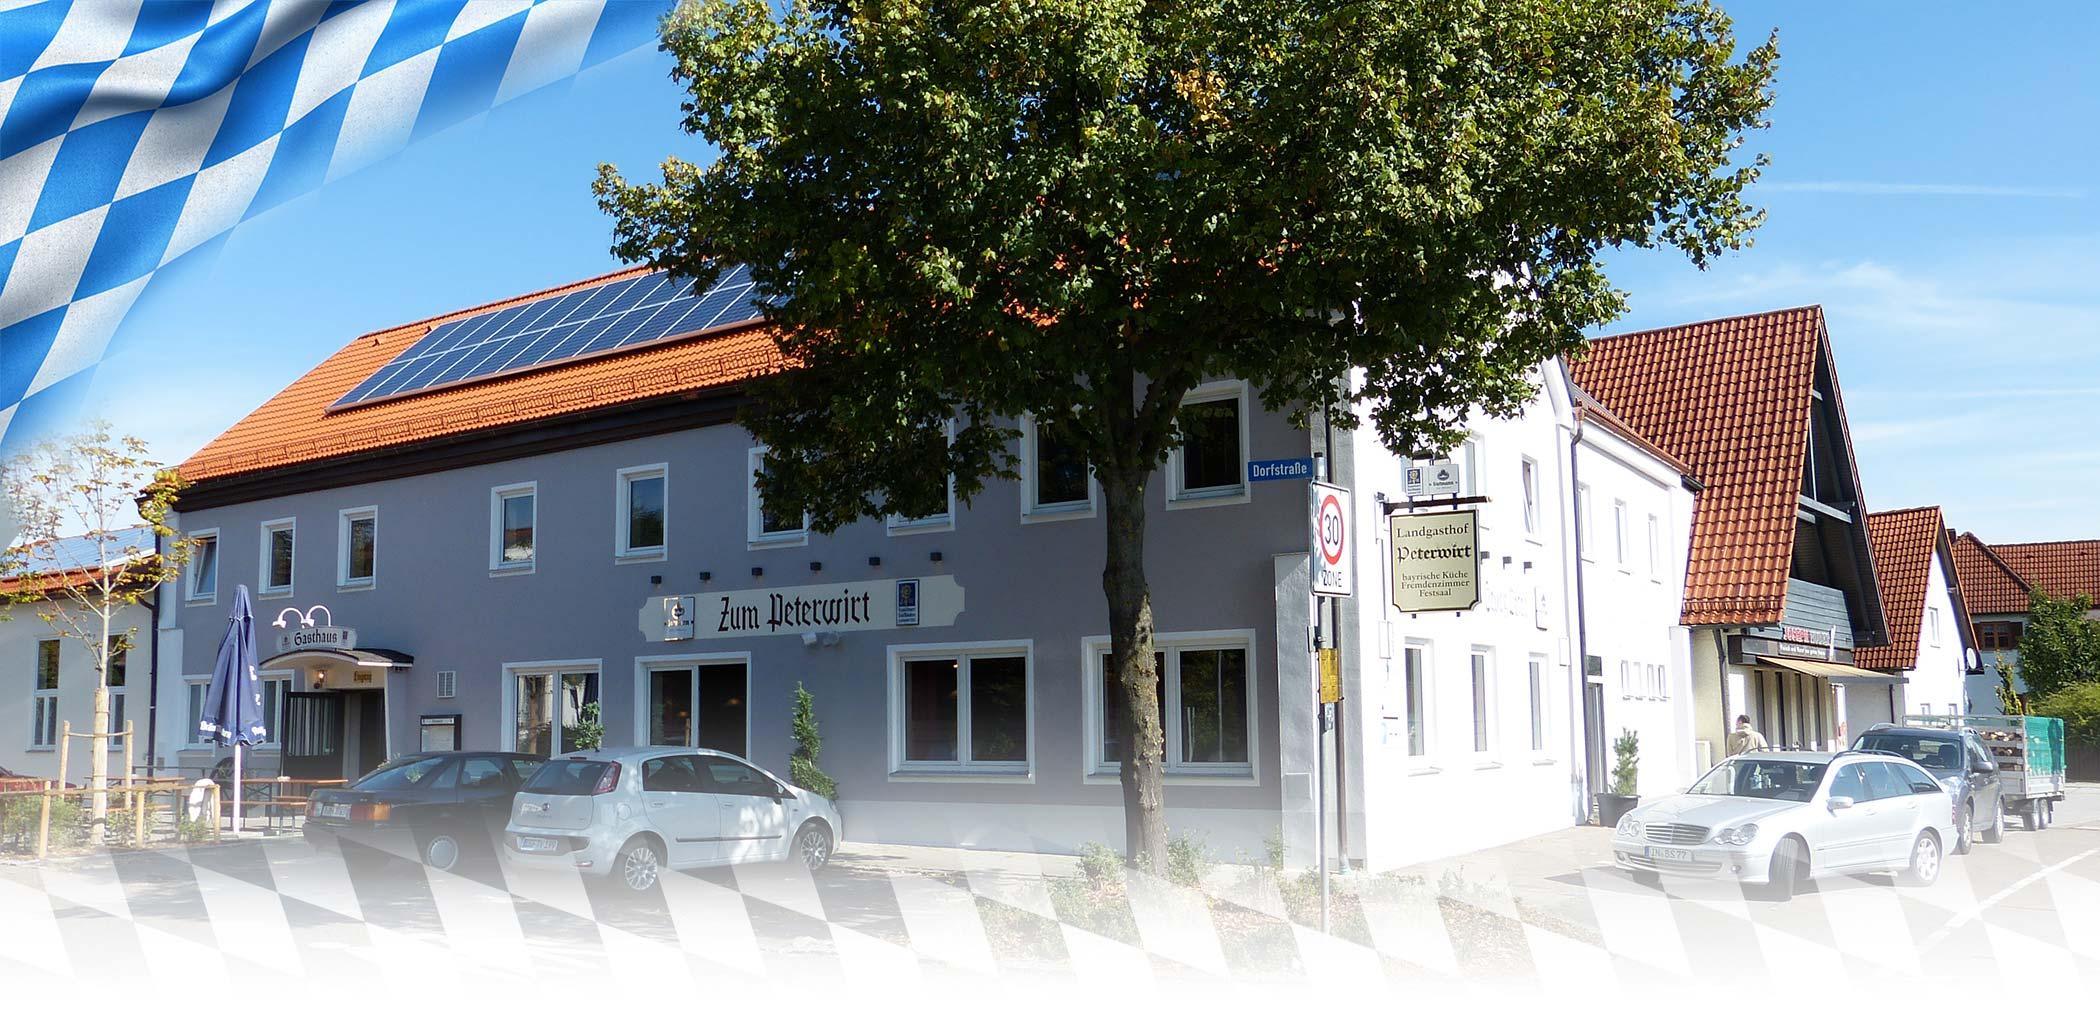 Peterwirt - Gasthof, Saal, Pension - Ingolstadt